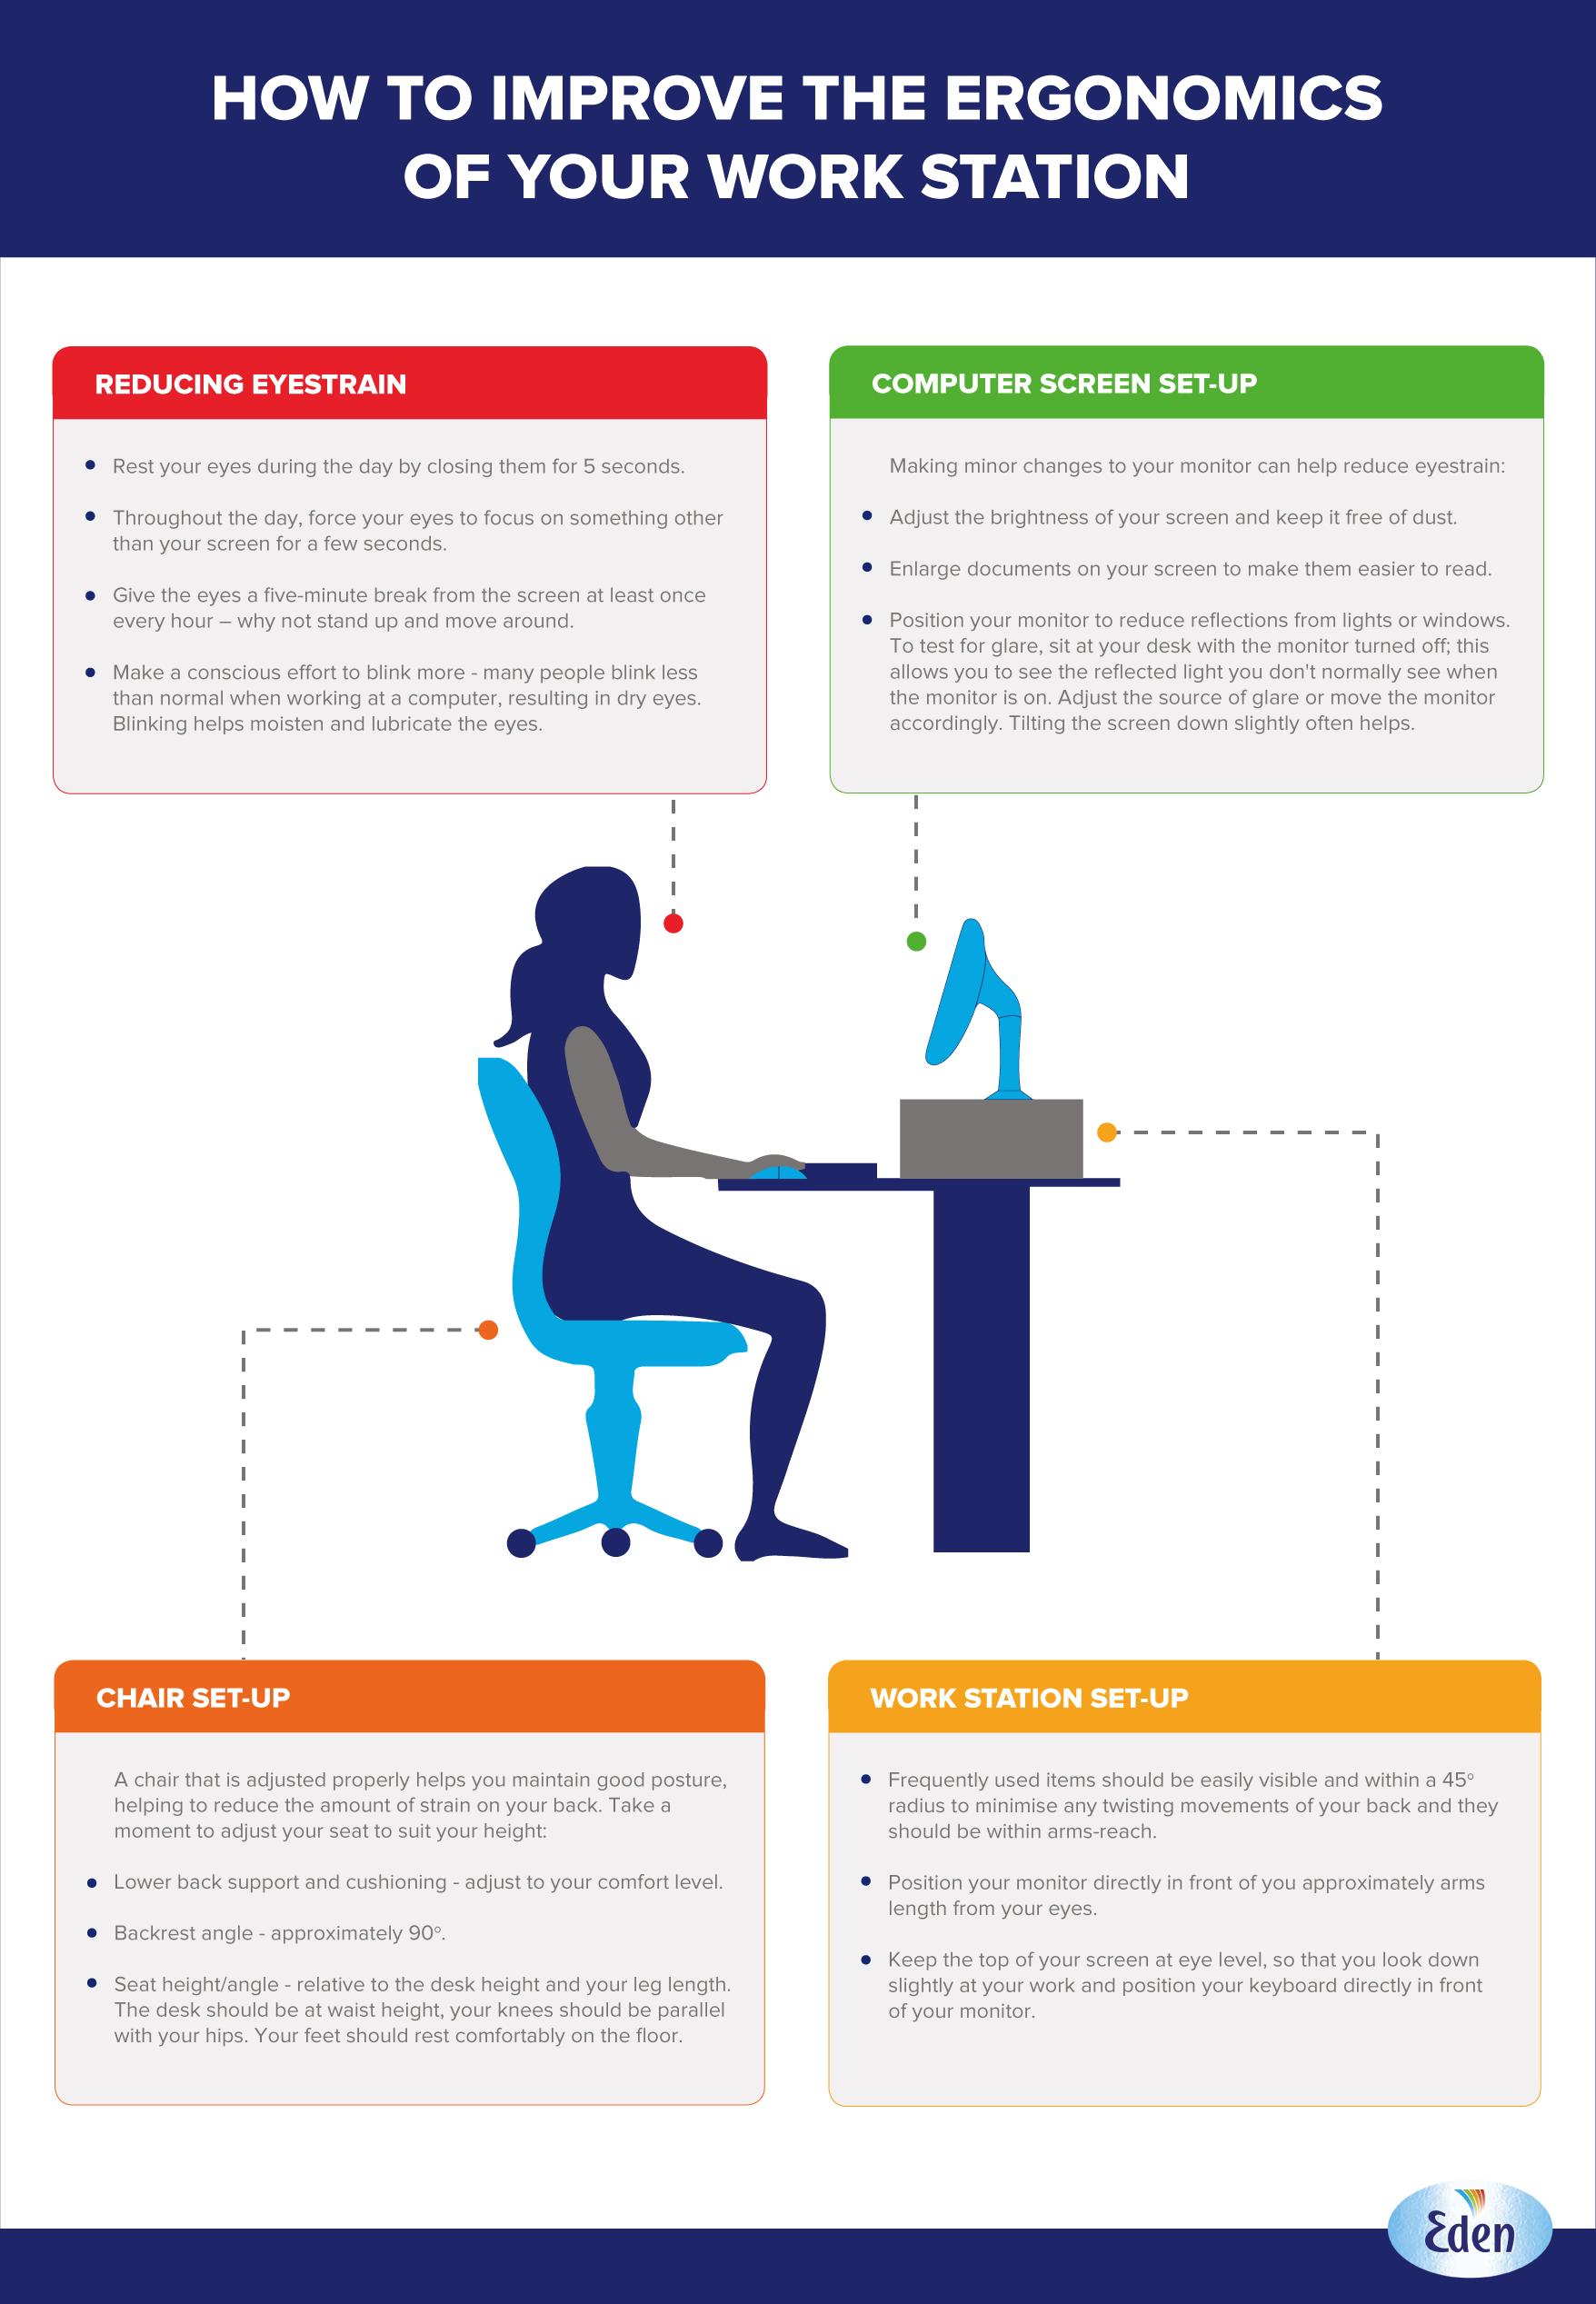 how to improve the ergonomics of your work station ergonomics rh pinterest com